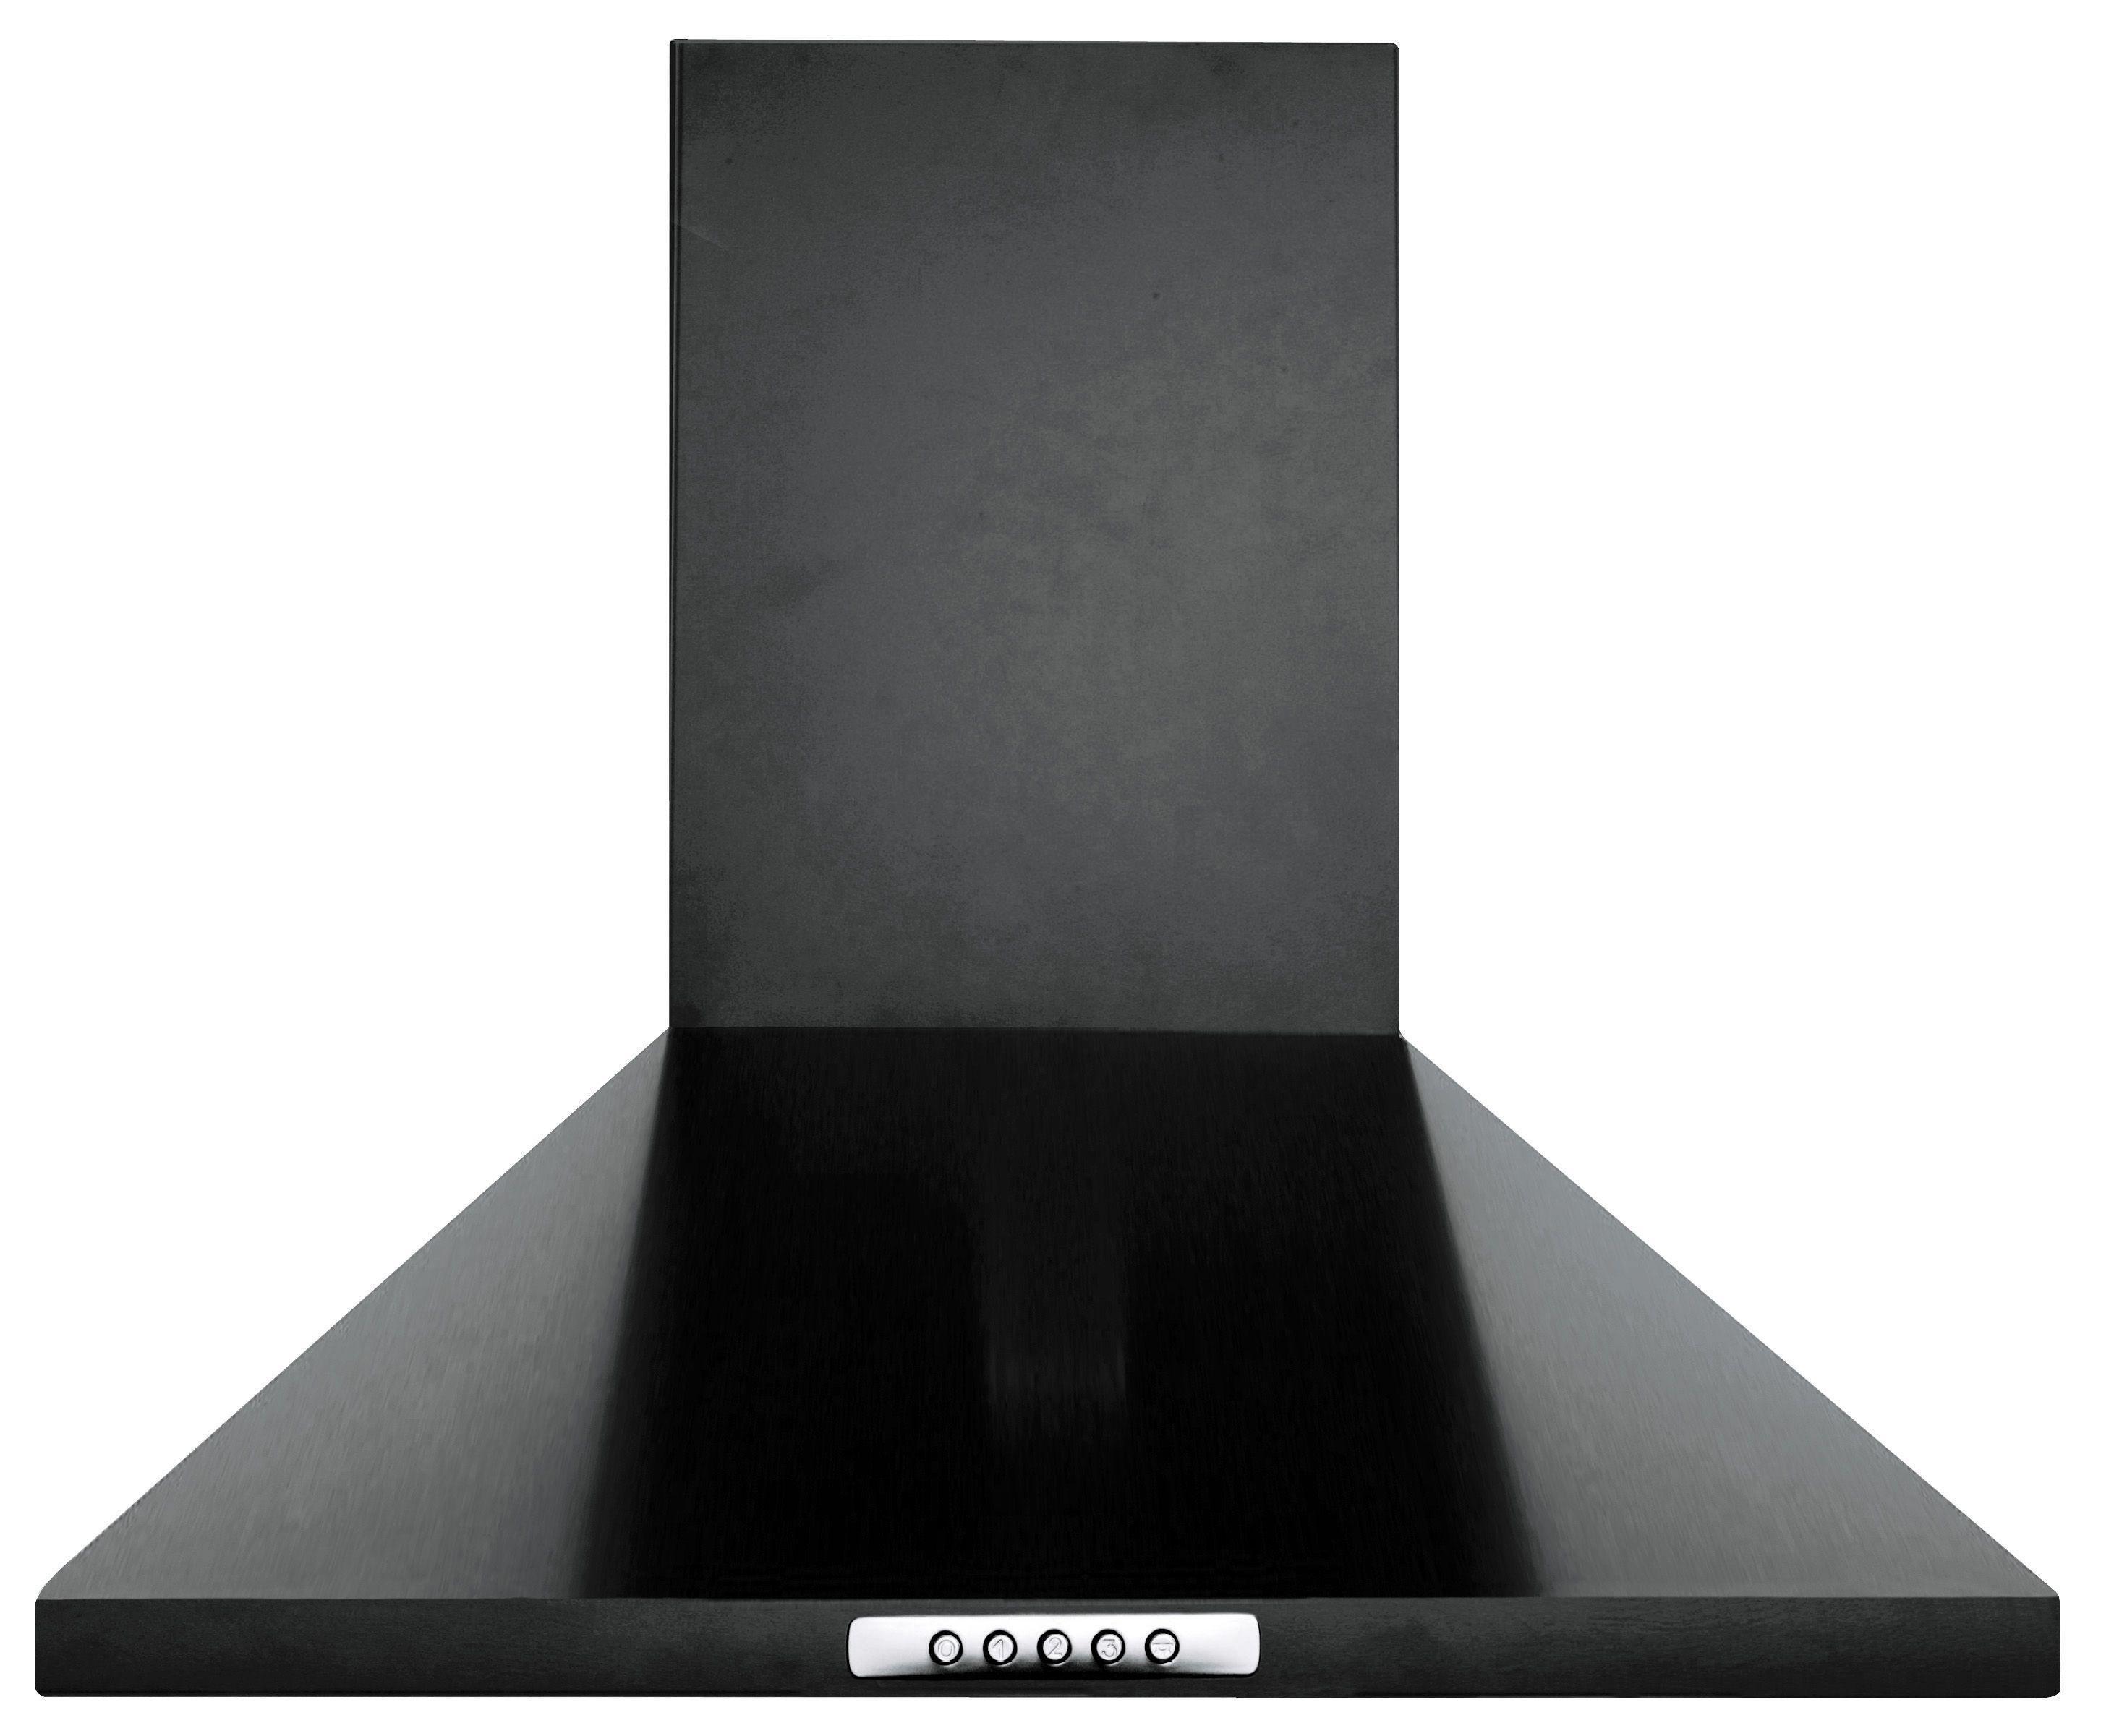 60cm Chimney Cooker Hood - Black